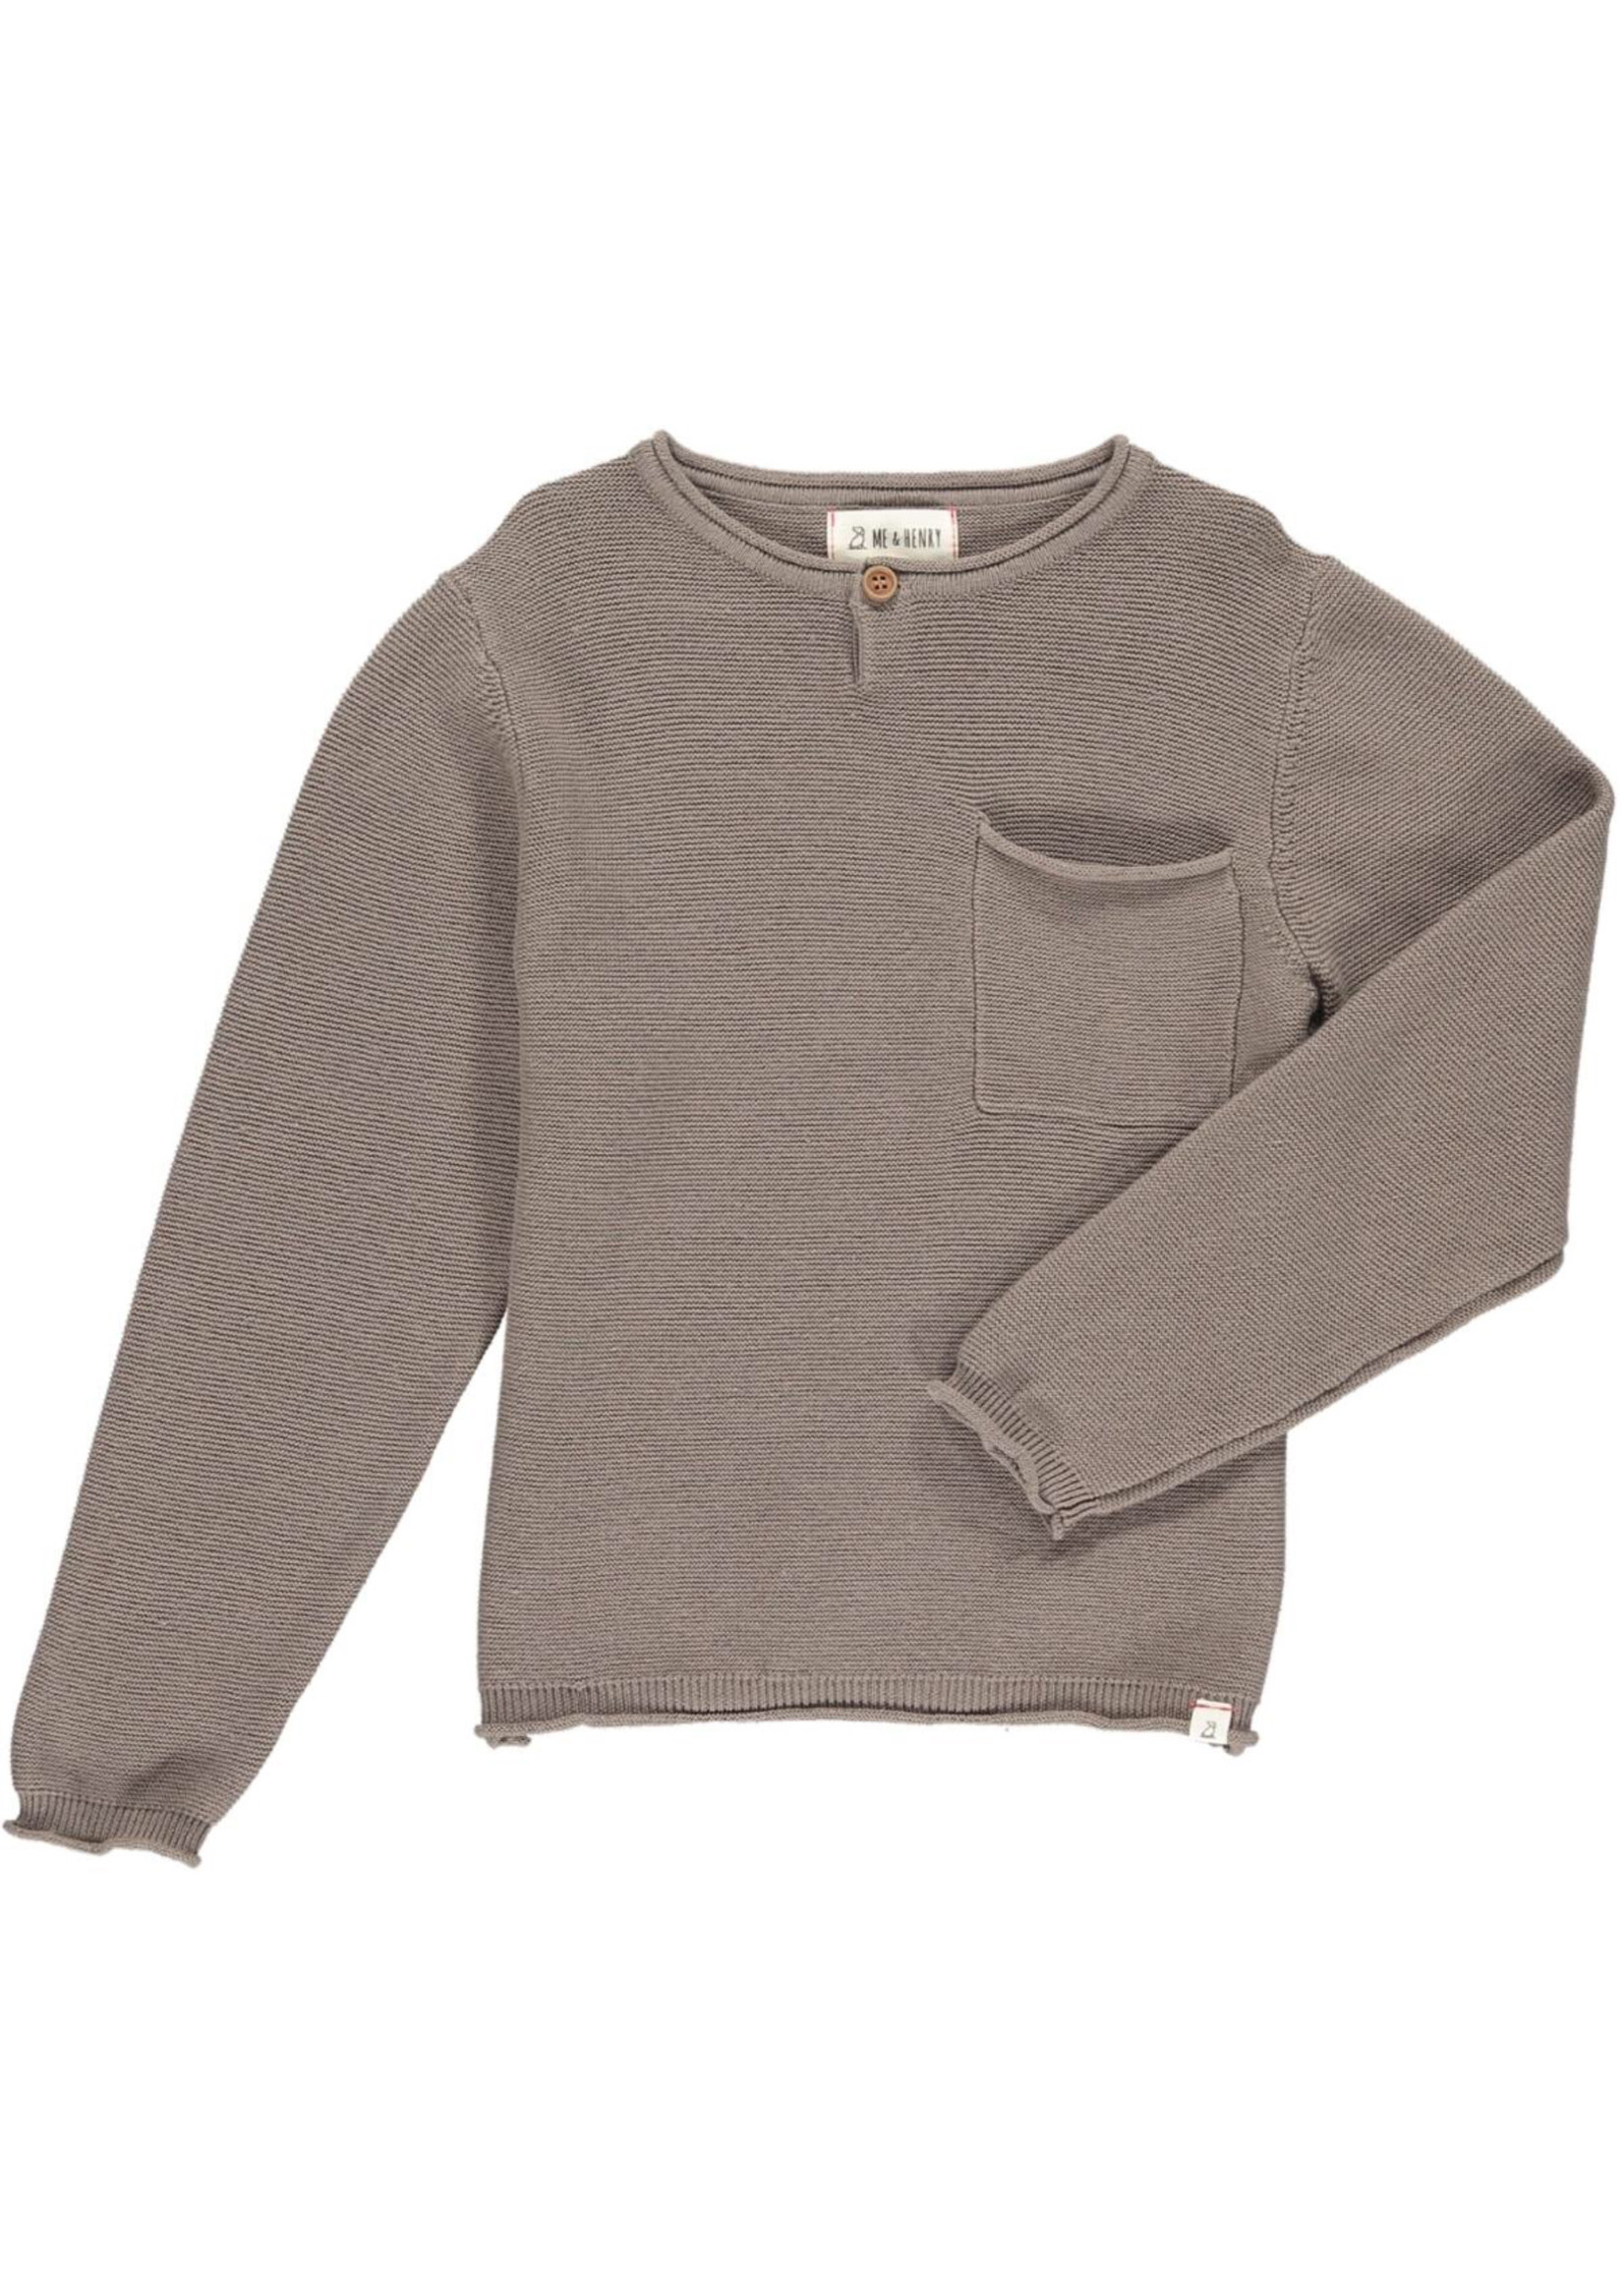 Me & Henry MH Dayton Sweater